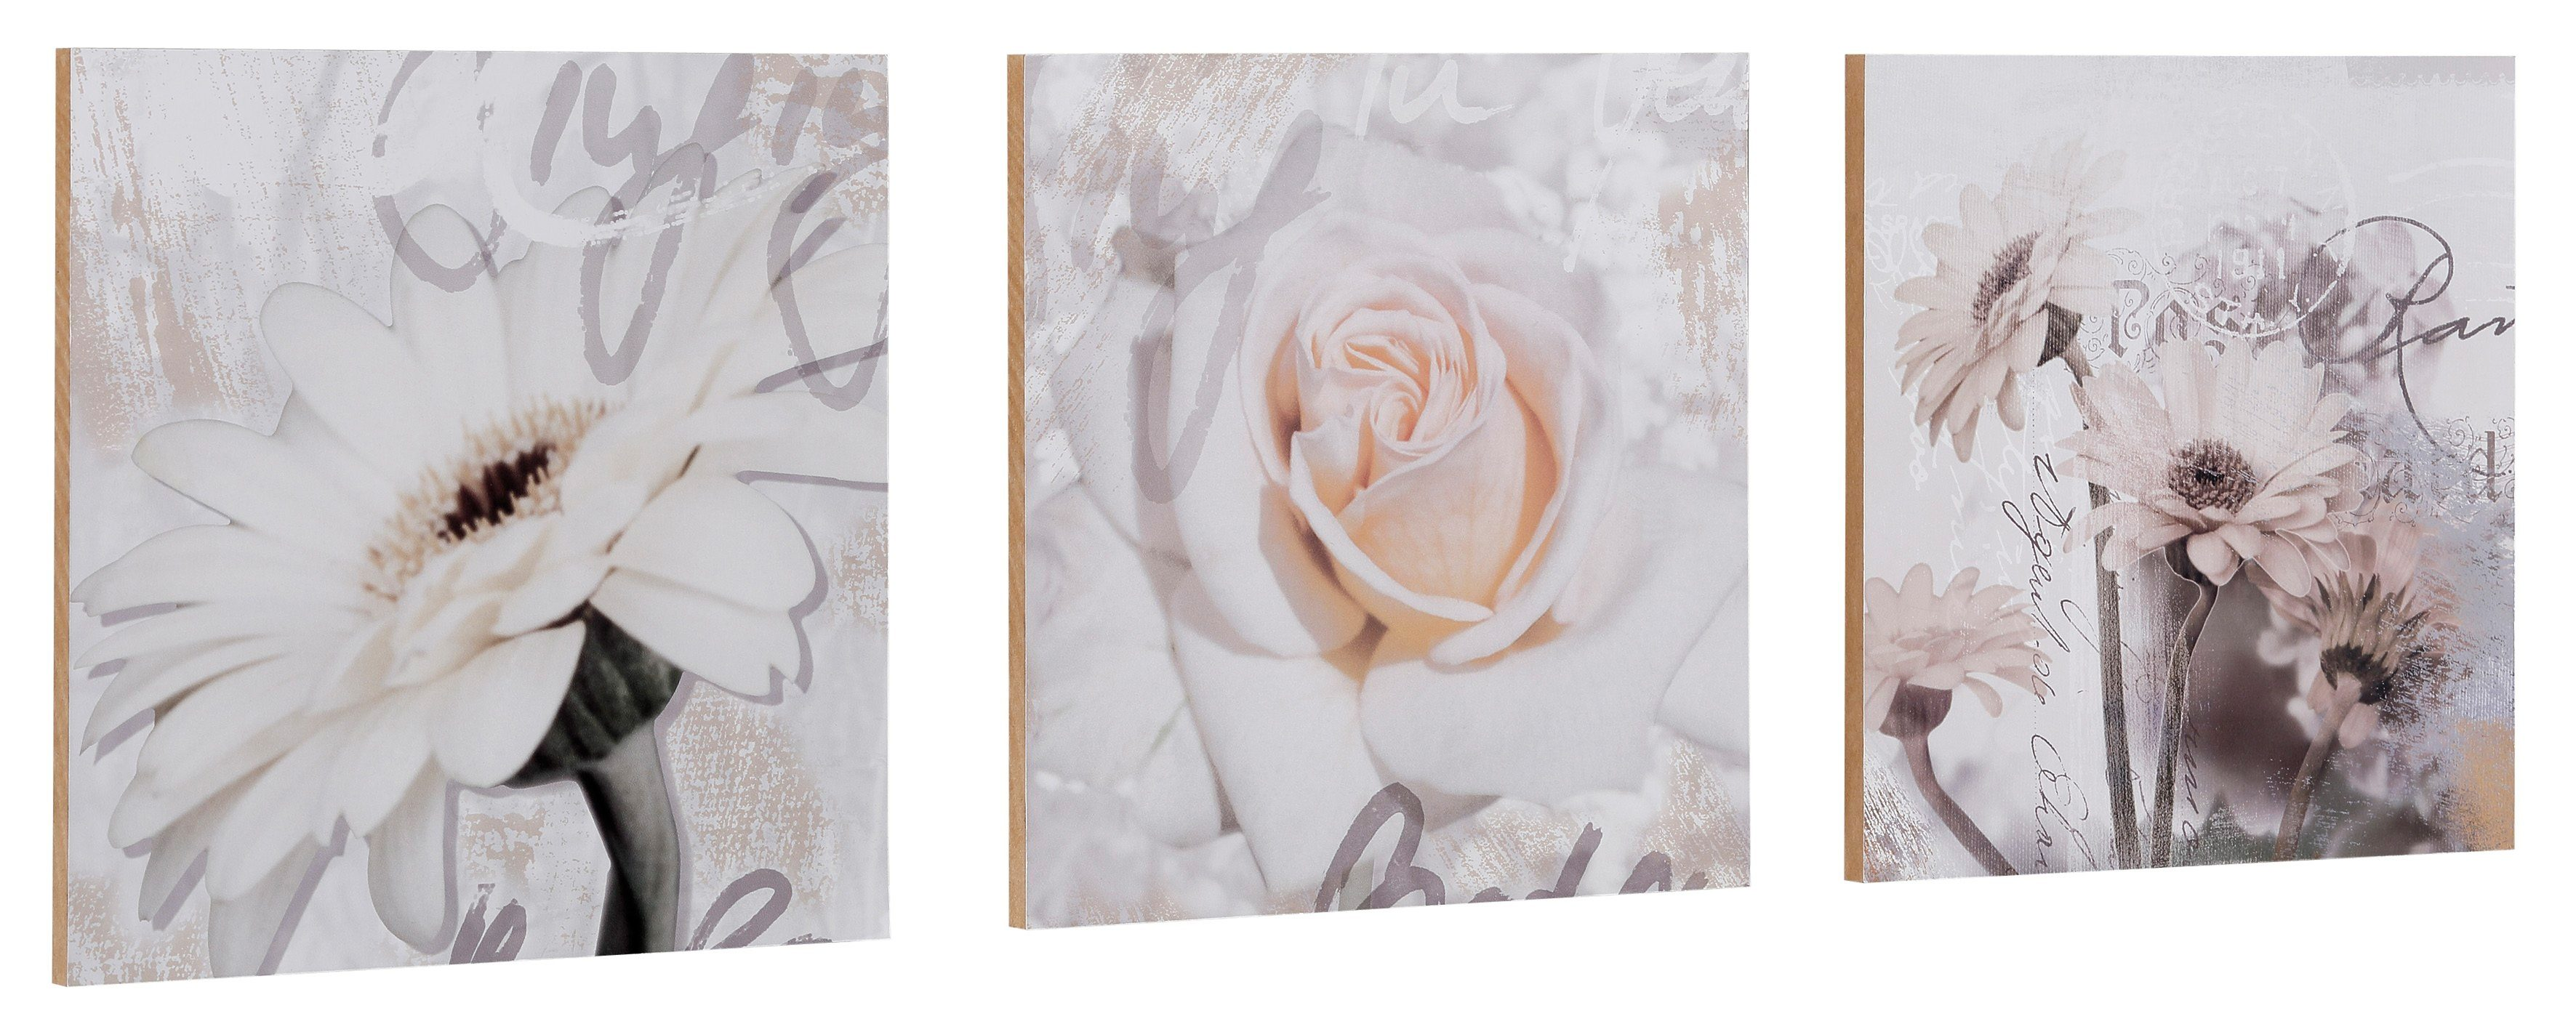 Home affaire Kunstdruck »S., D.: Gerberas Detail«, Blumen, 3-tlg., je 29/29 cm